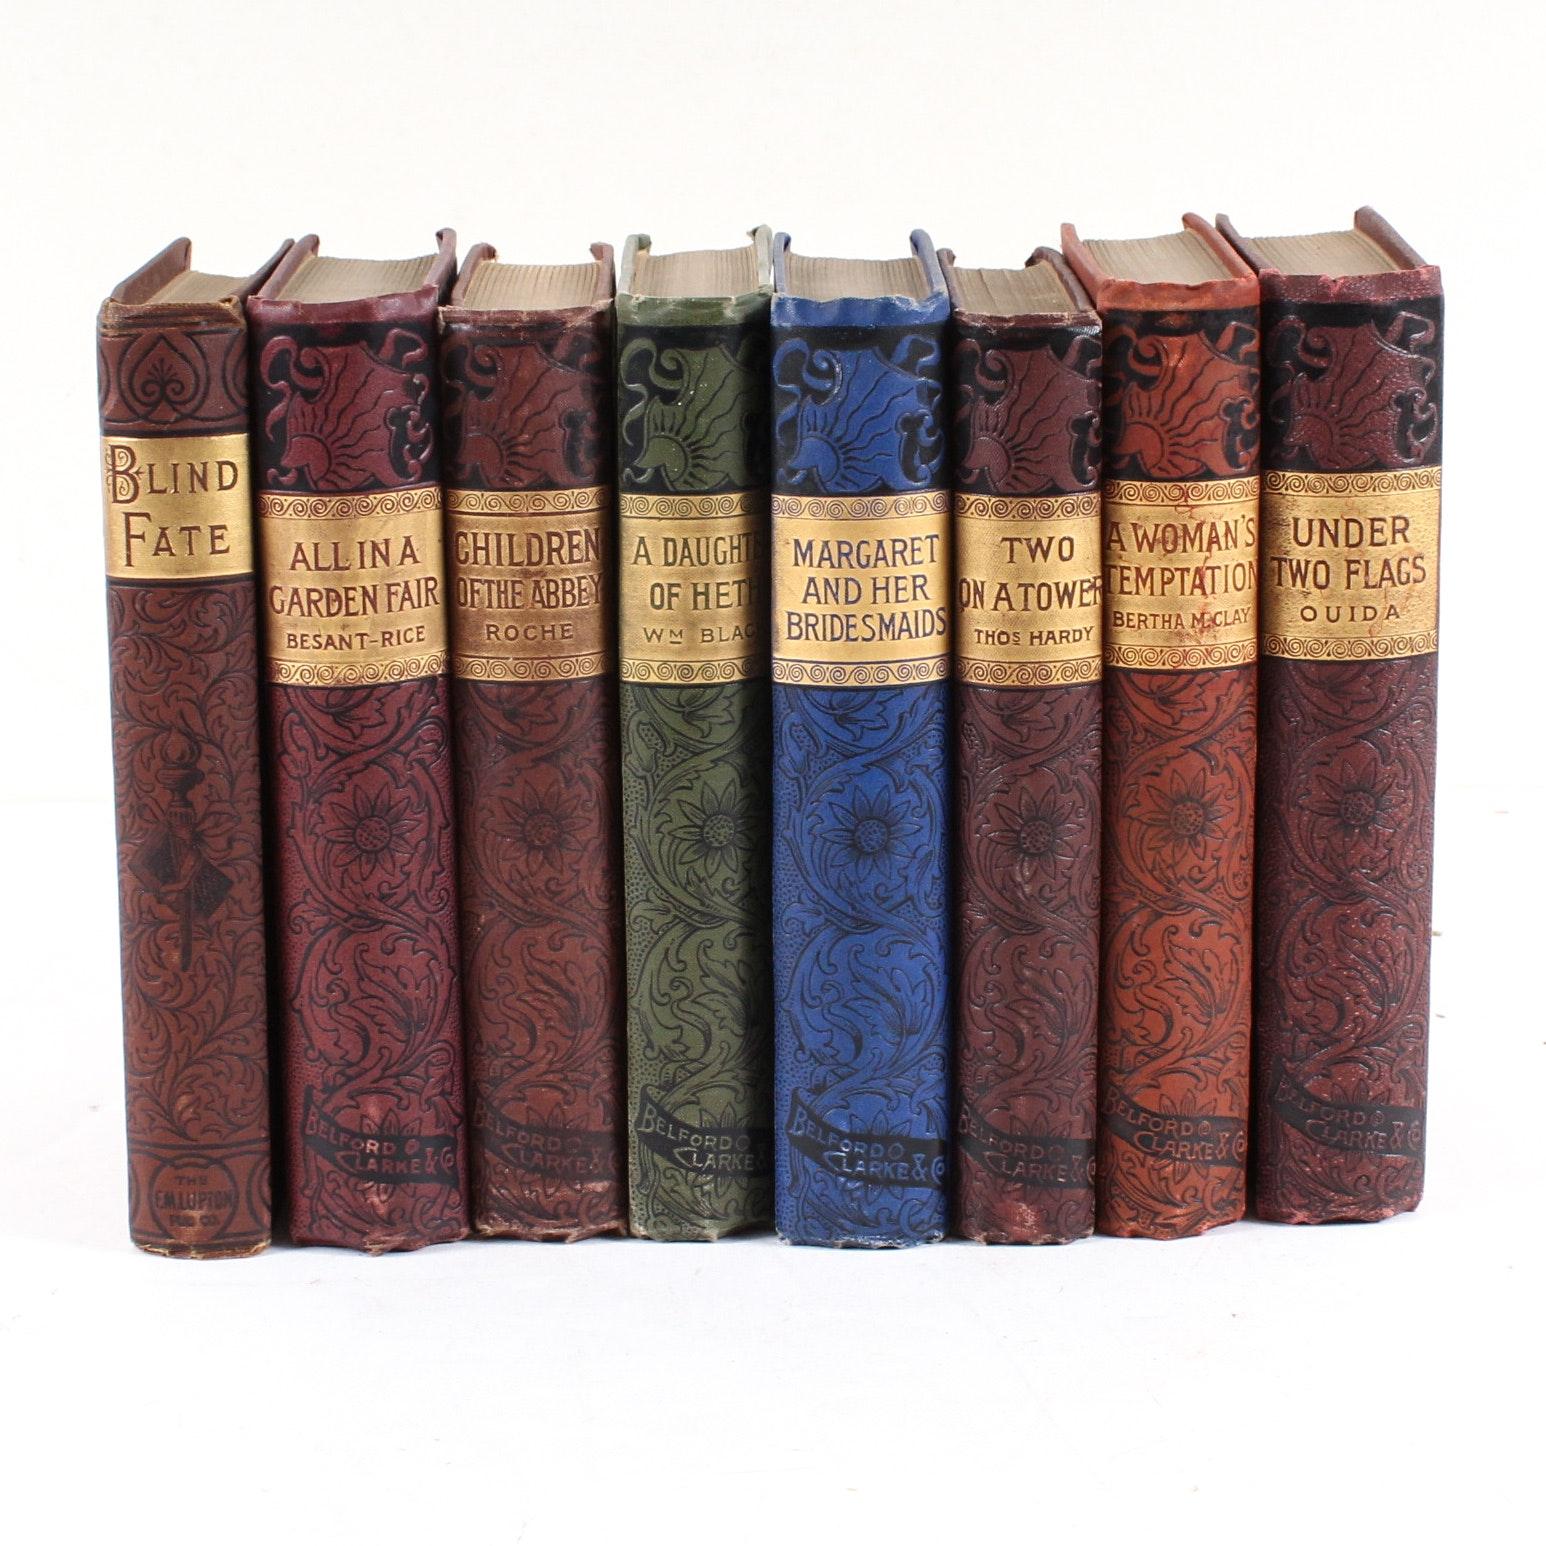 Early 20th Century Caxton Edition Novels